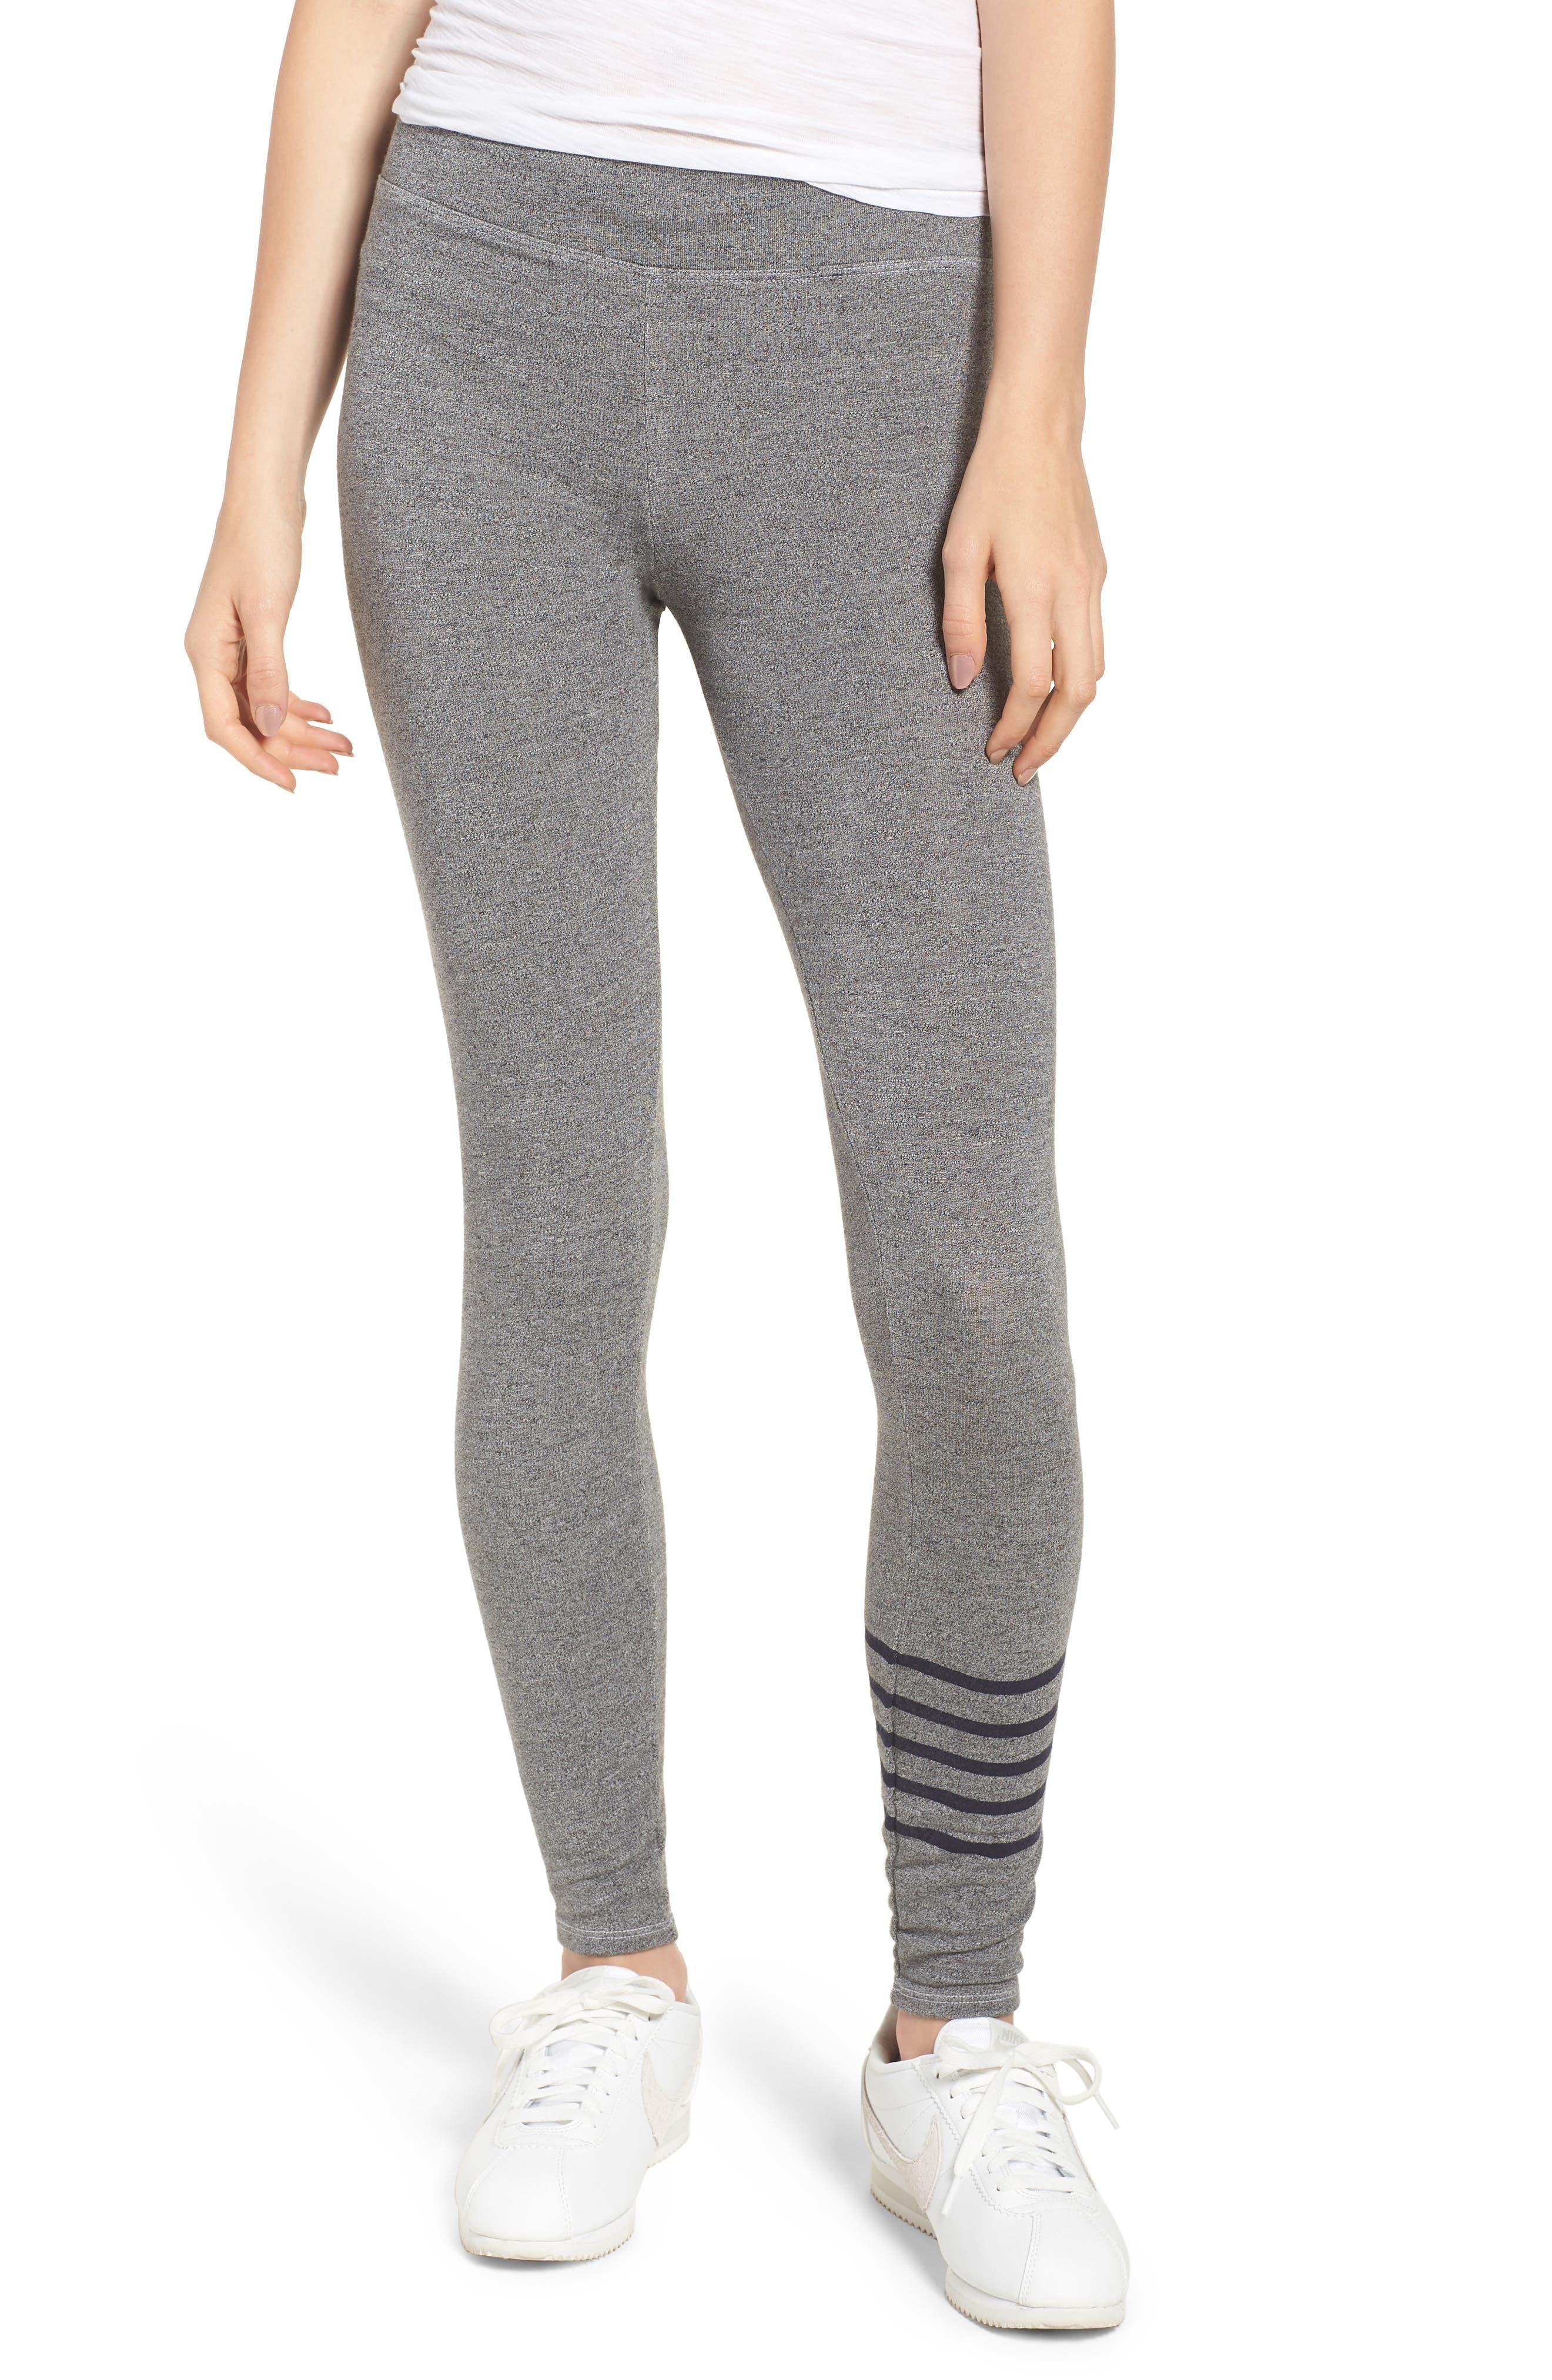 Stripe Yoga Pants,                             Main thumbnail 1, color,                             Heather Grey